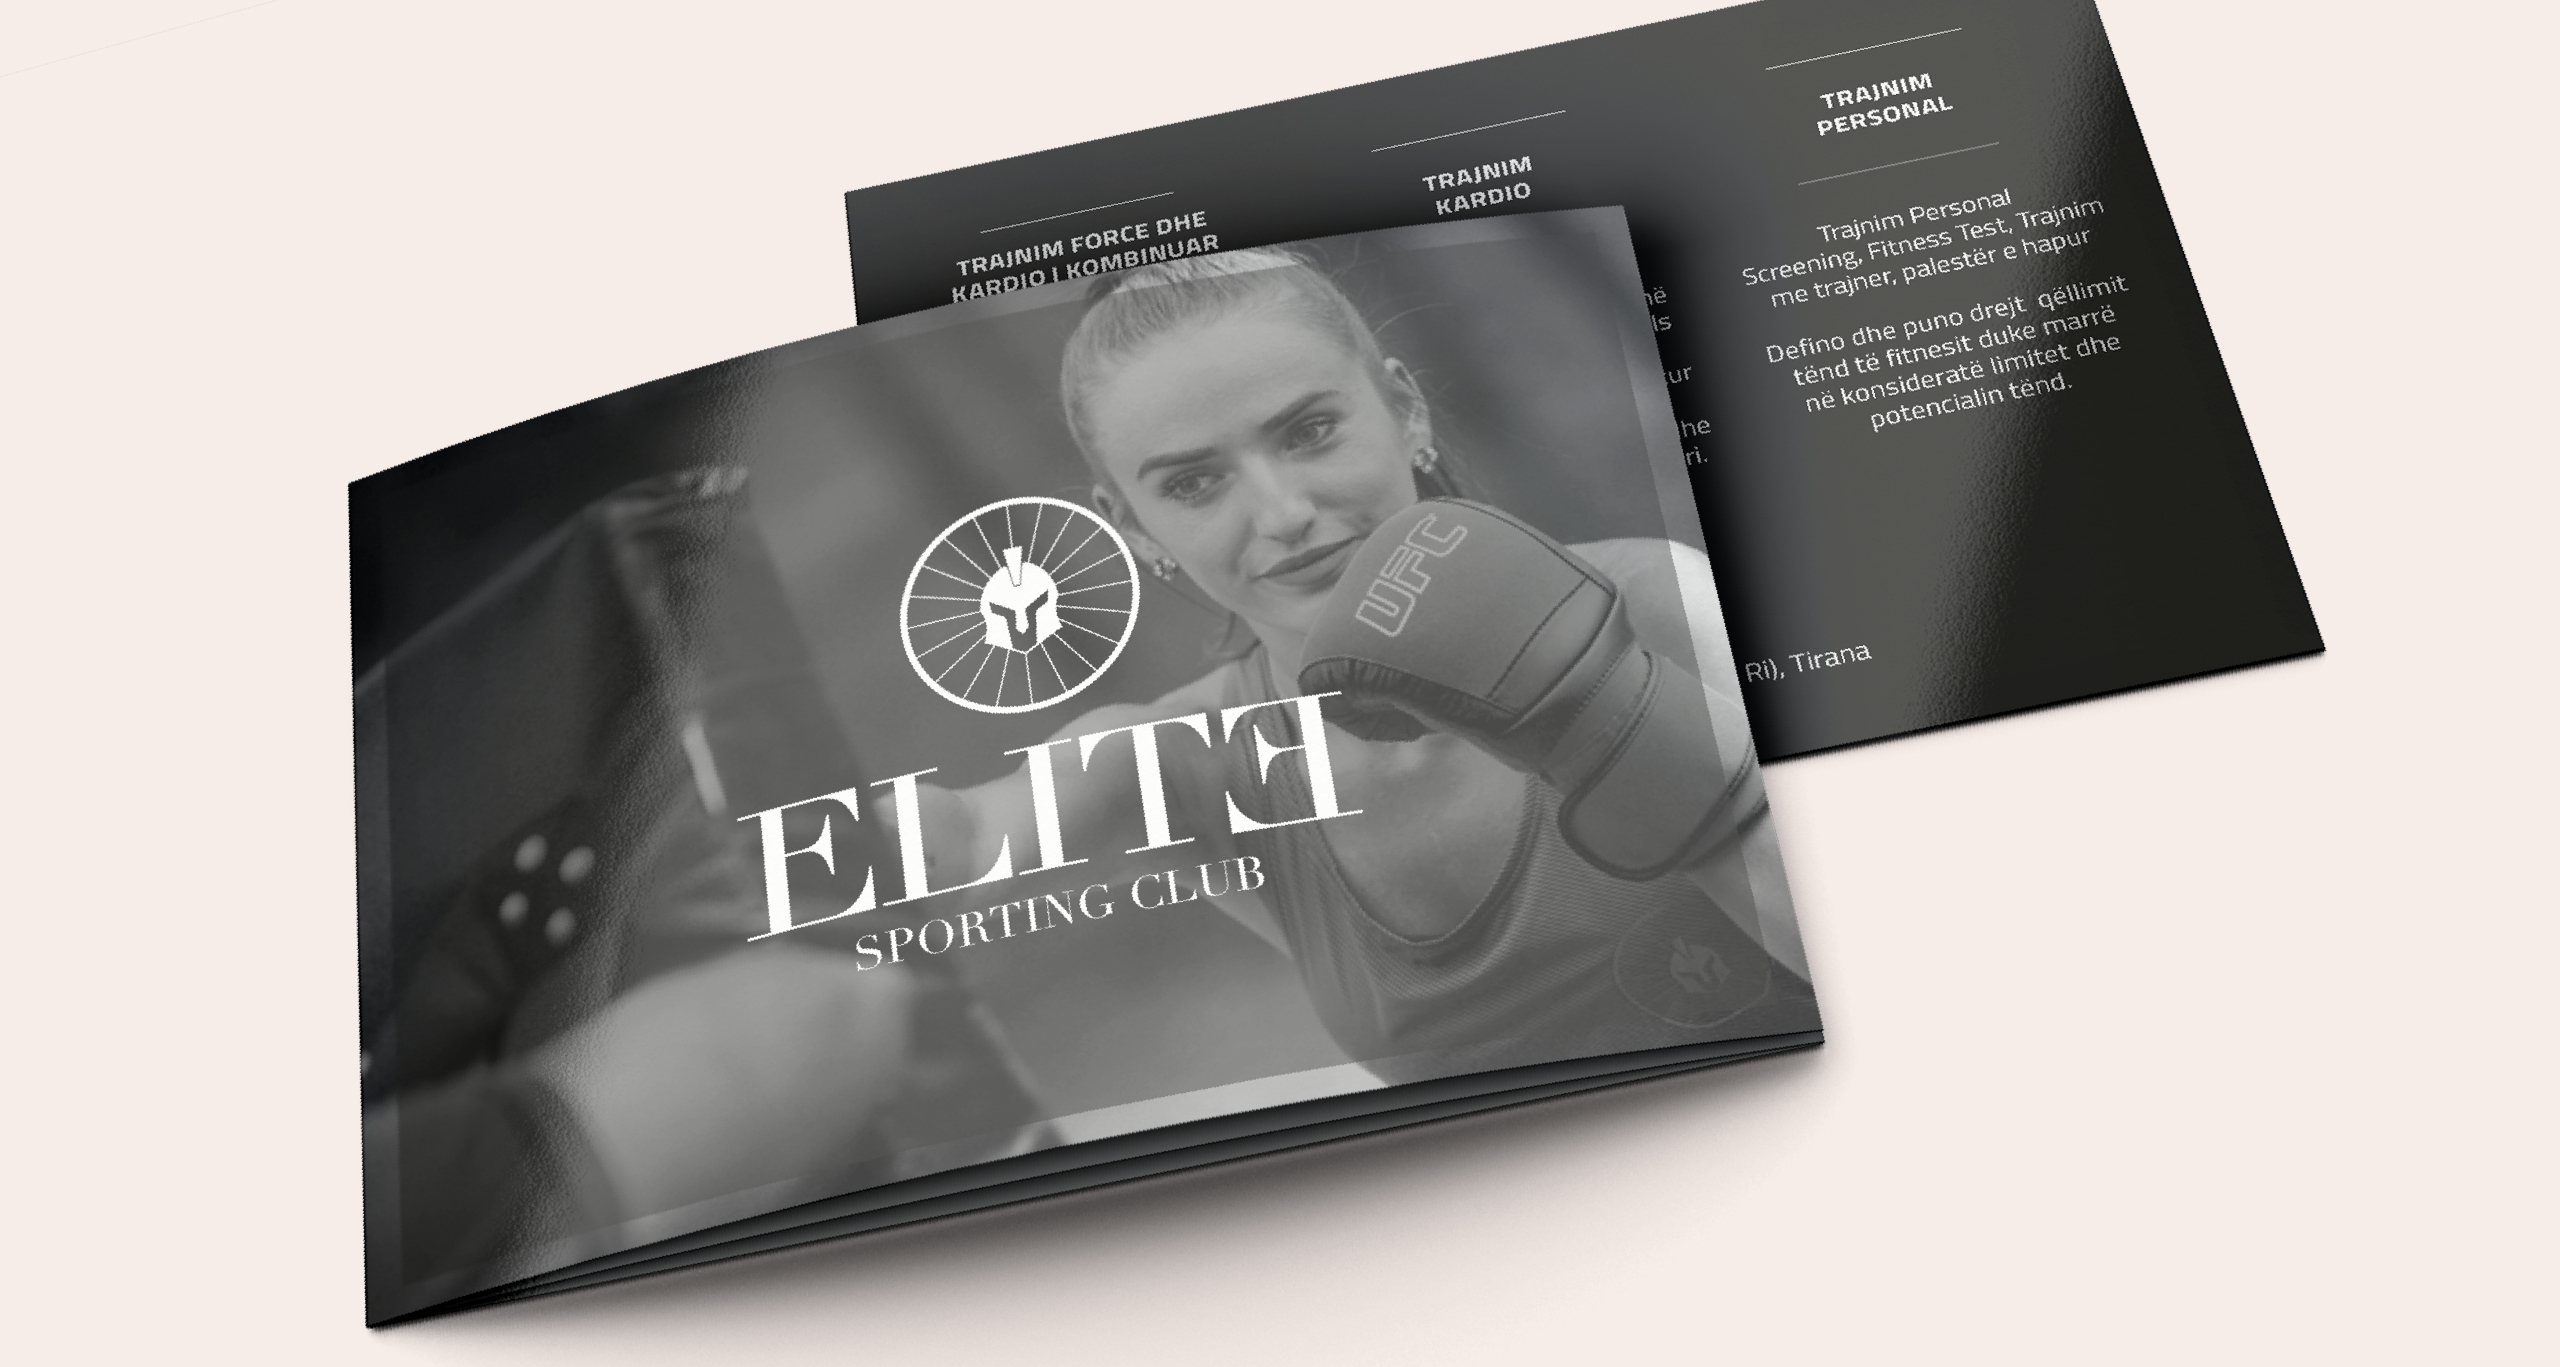 Elite Sporting Club logo and handout